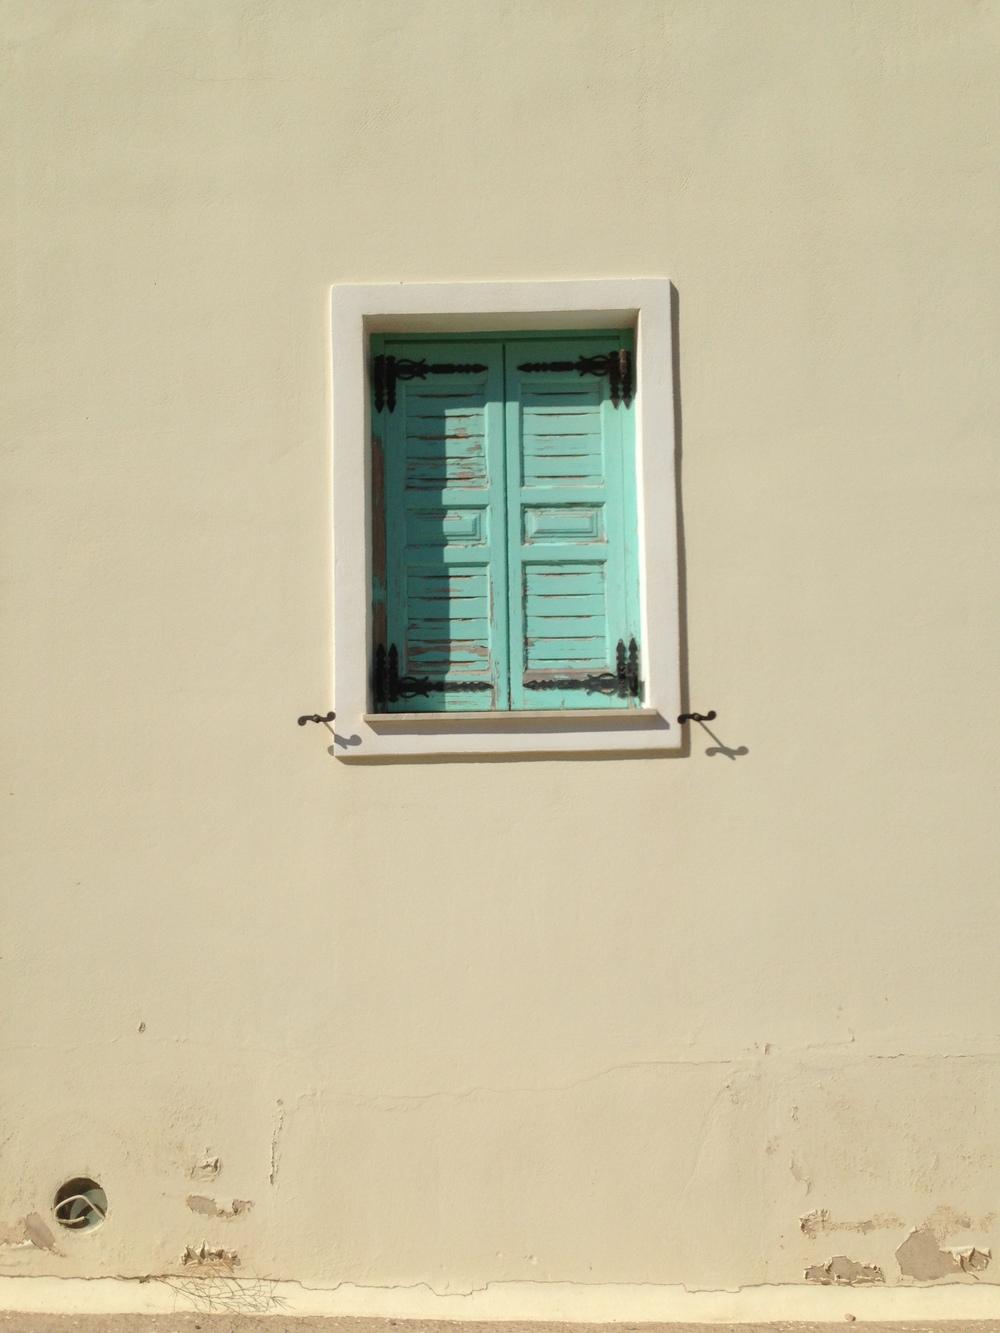 +1 window